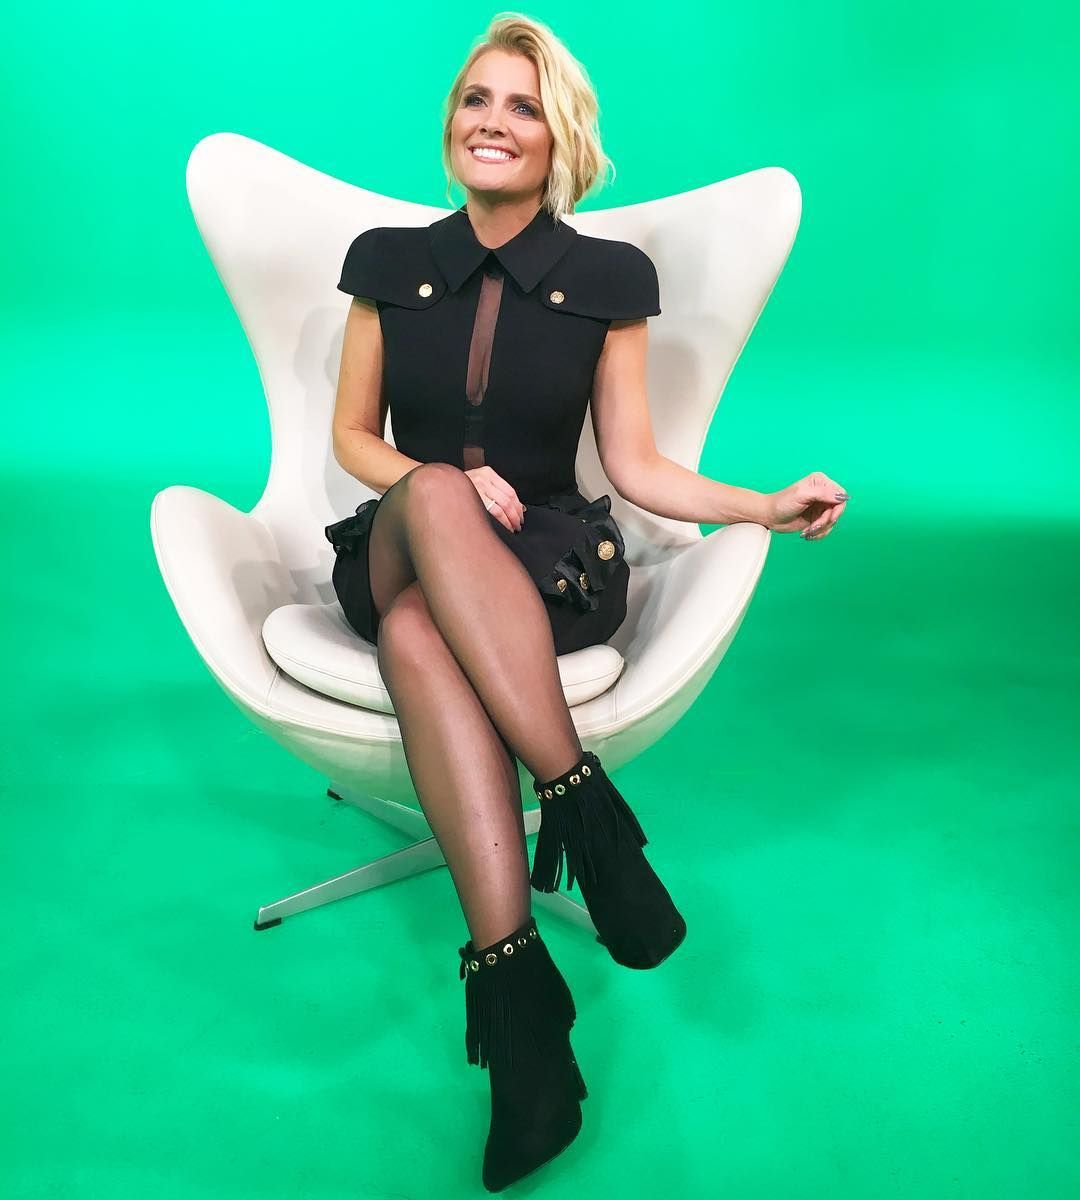 jennifer knaeble | Fernsehfrauen in Pantyhose | Fashion ...